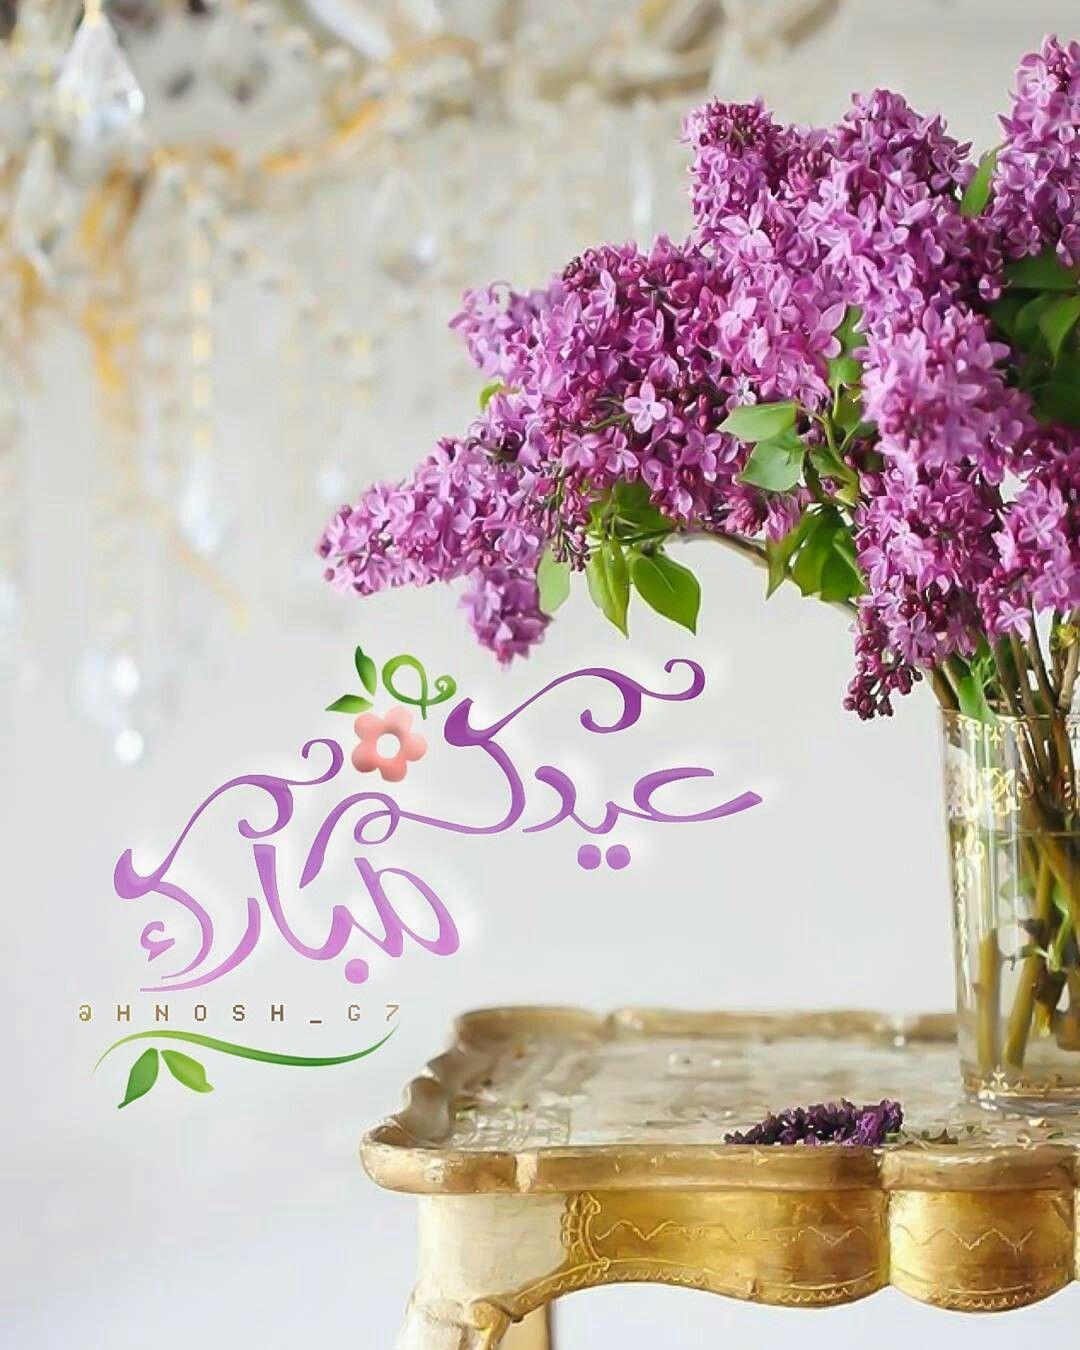 عيدكم مبارك أحبتي Eid Greetings Eid Images Eid Mubarak Greetings